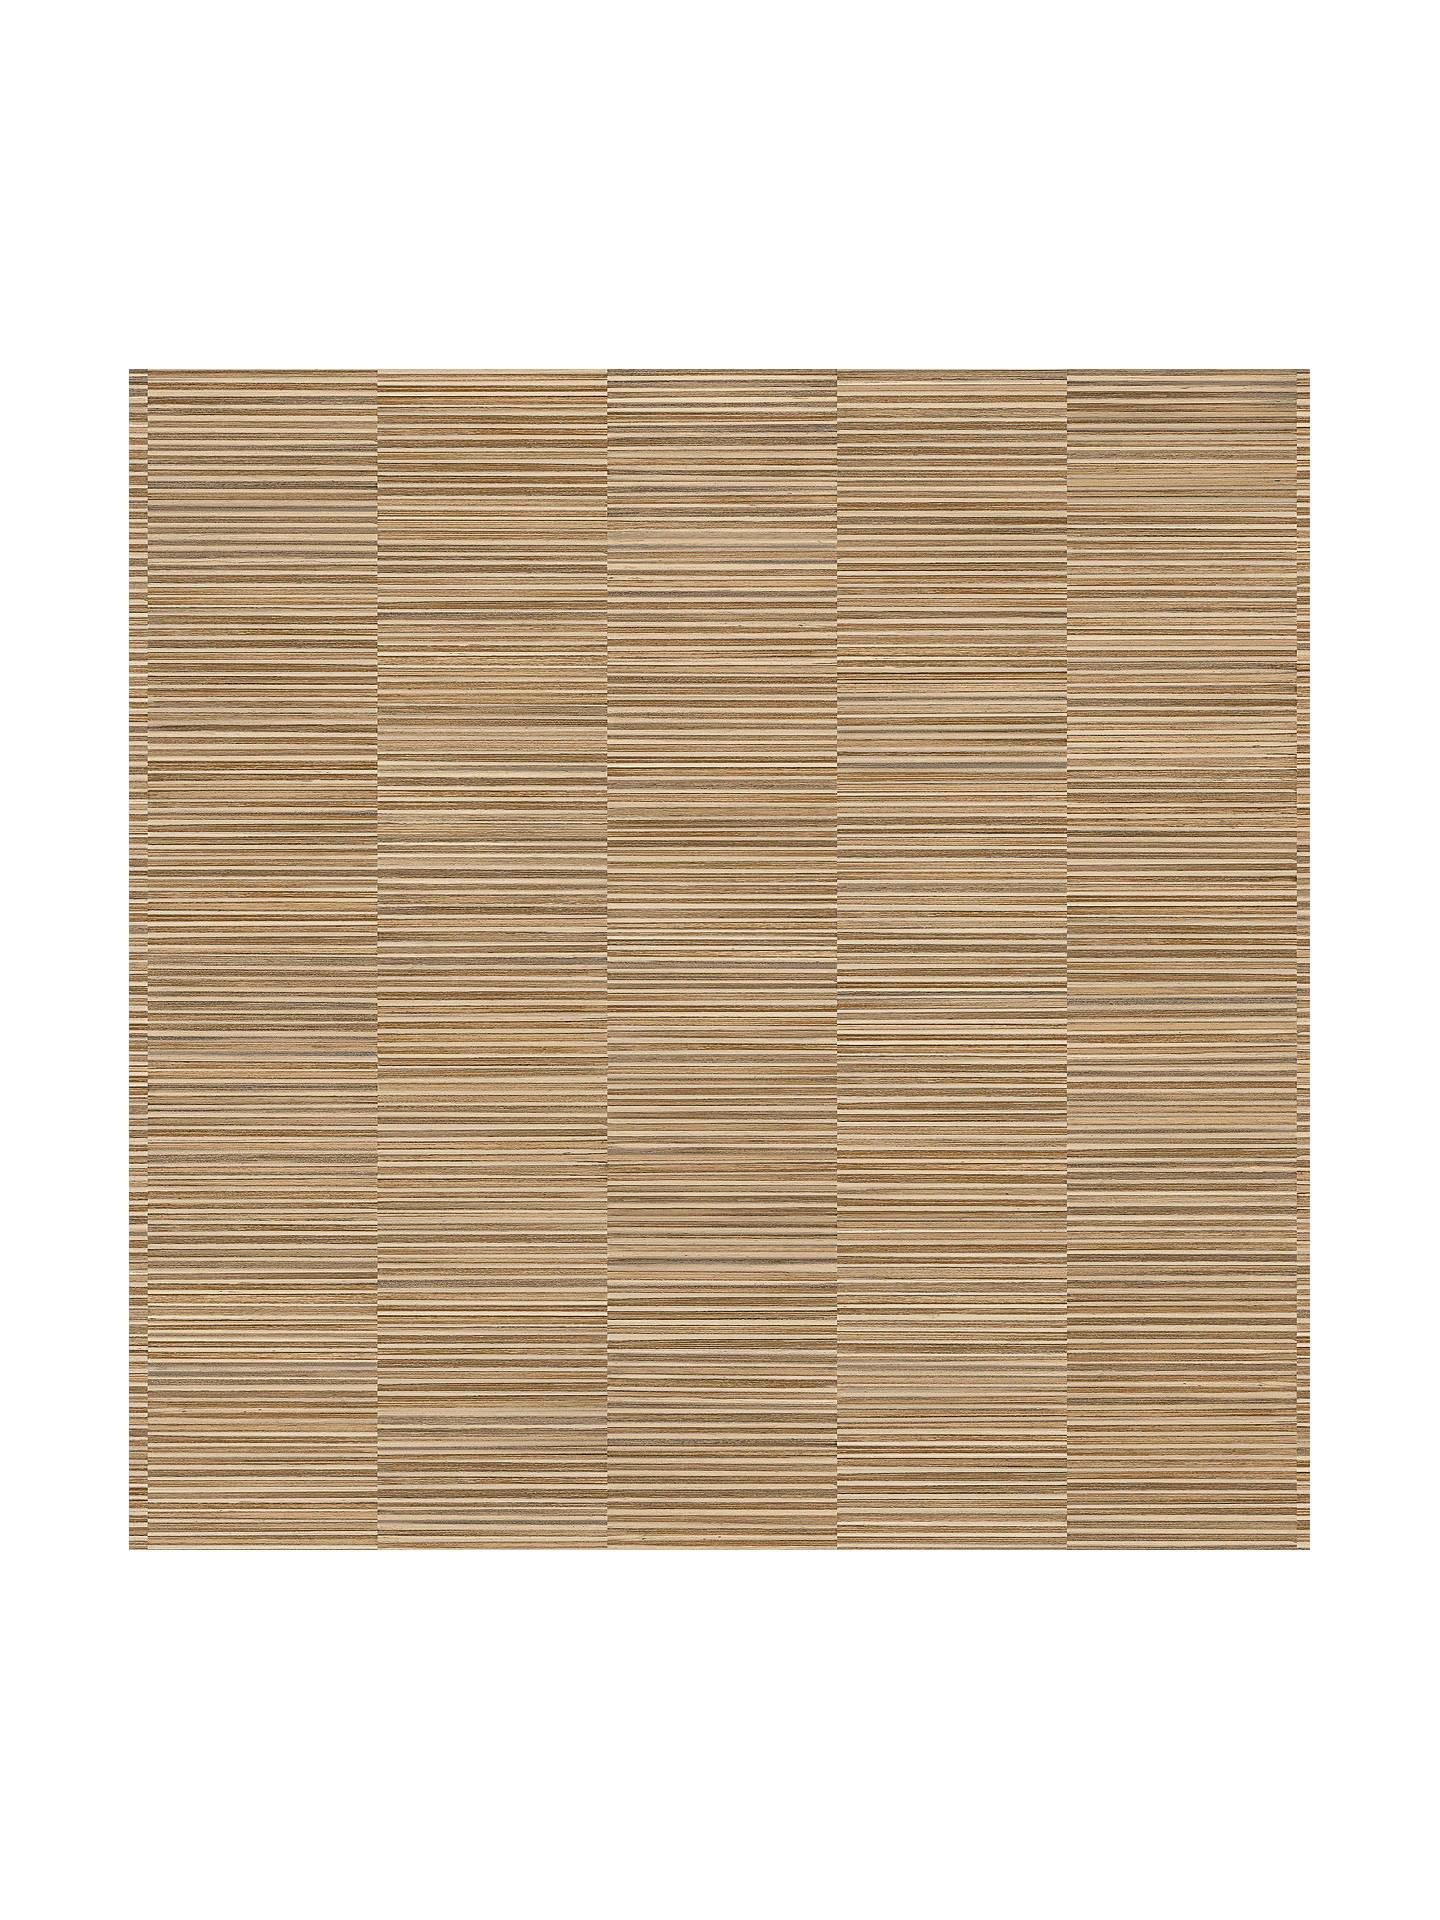 john lewis partners design ultimate 20 vinyl flooring at john lewis partners. Black Bedroom Furniture Sets. Home Design Ideas